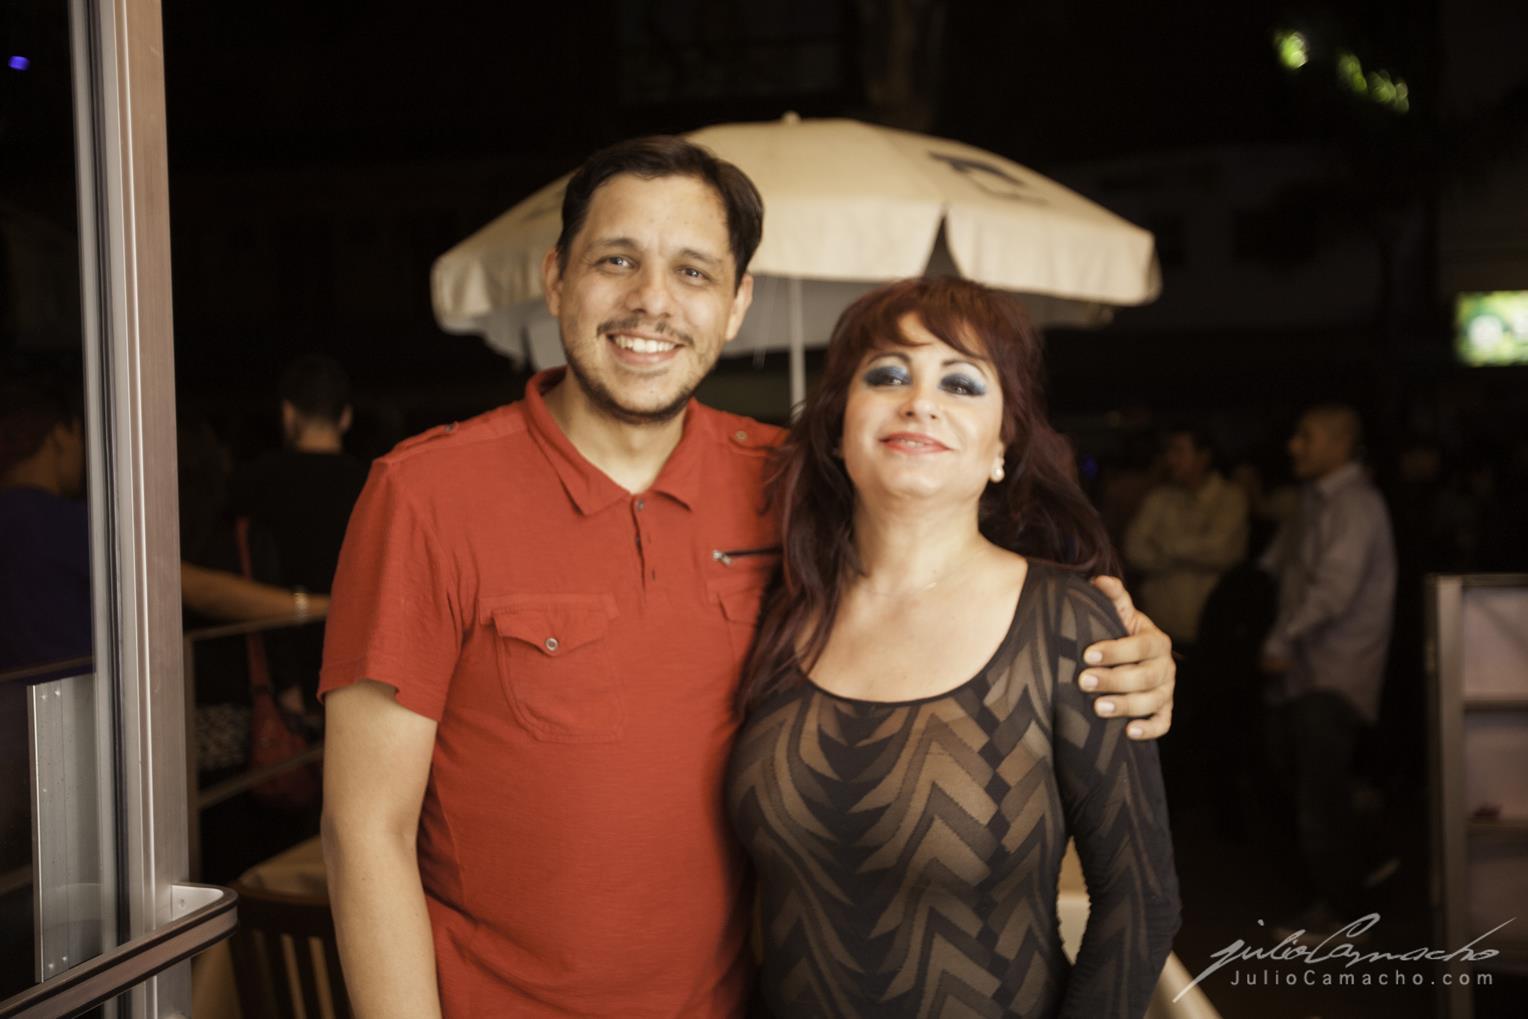 2014-10-30 31 CAST TOUR Ensenada y Tijuana - 1893 - www.Juli (Copy).jpg